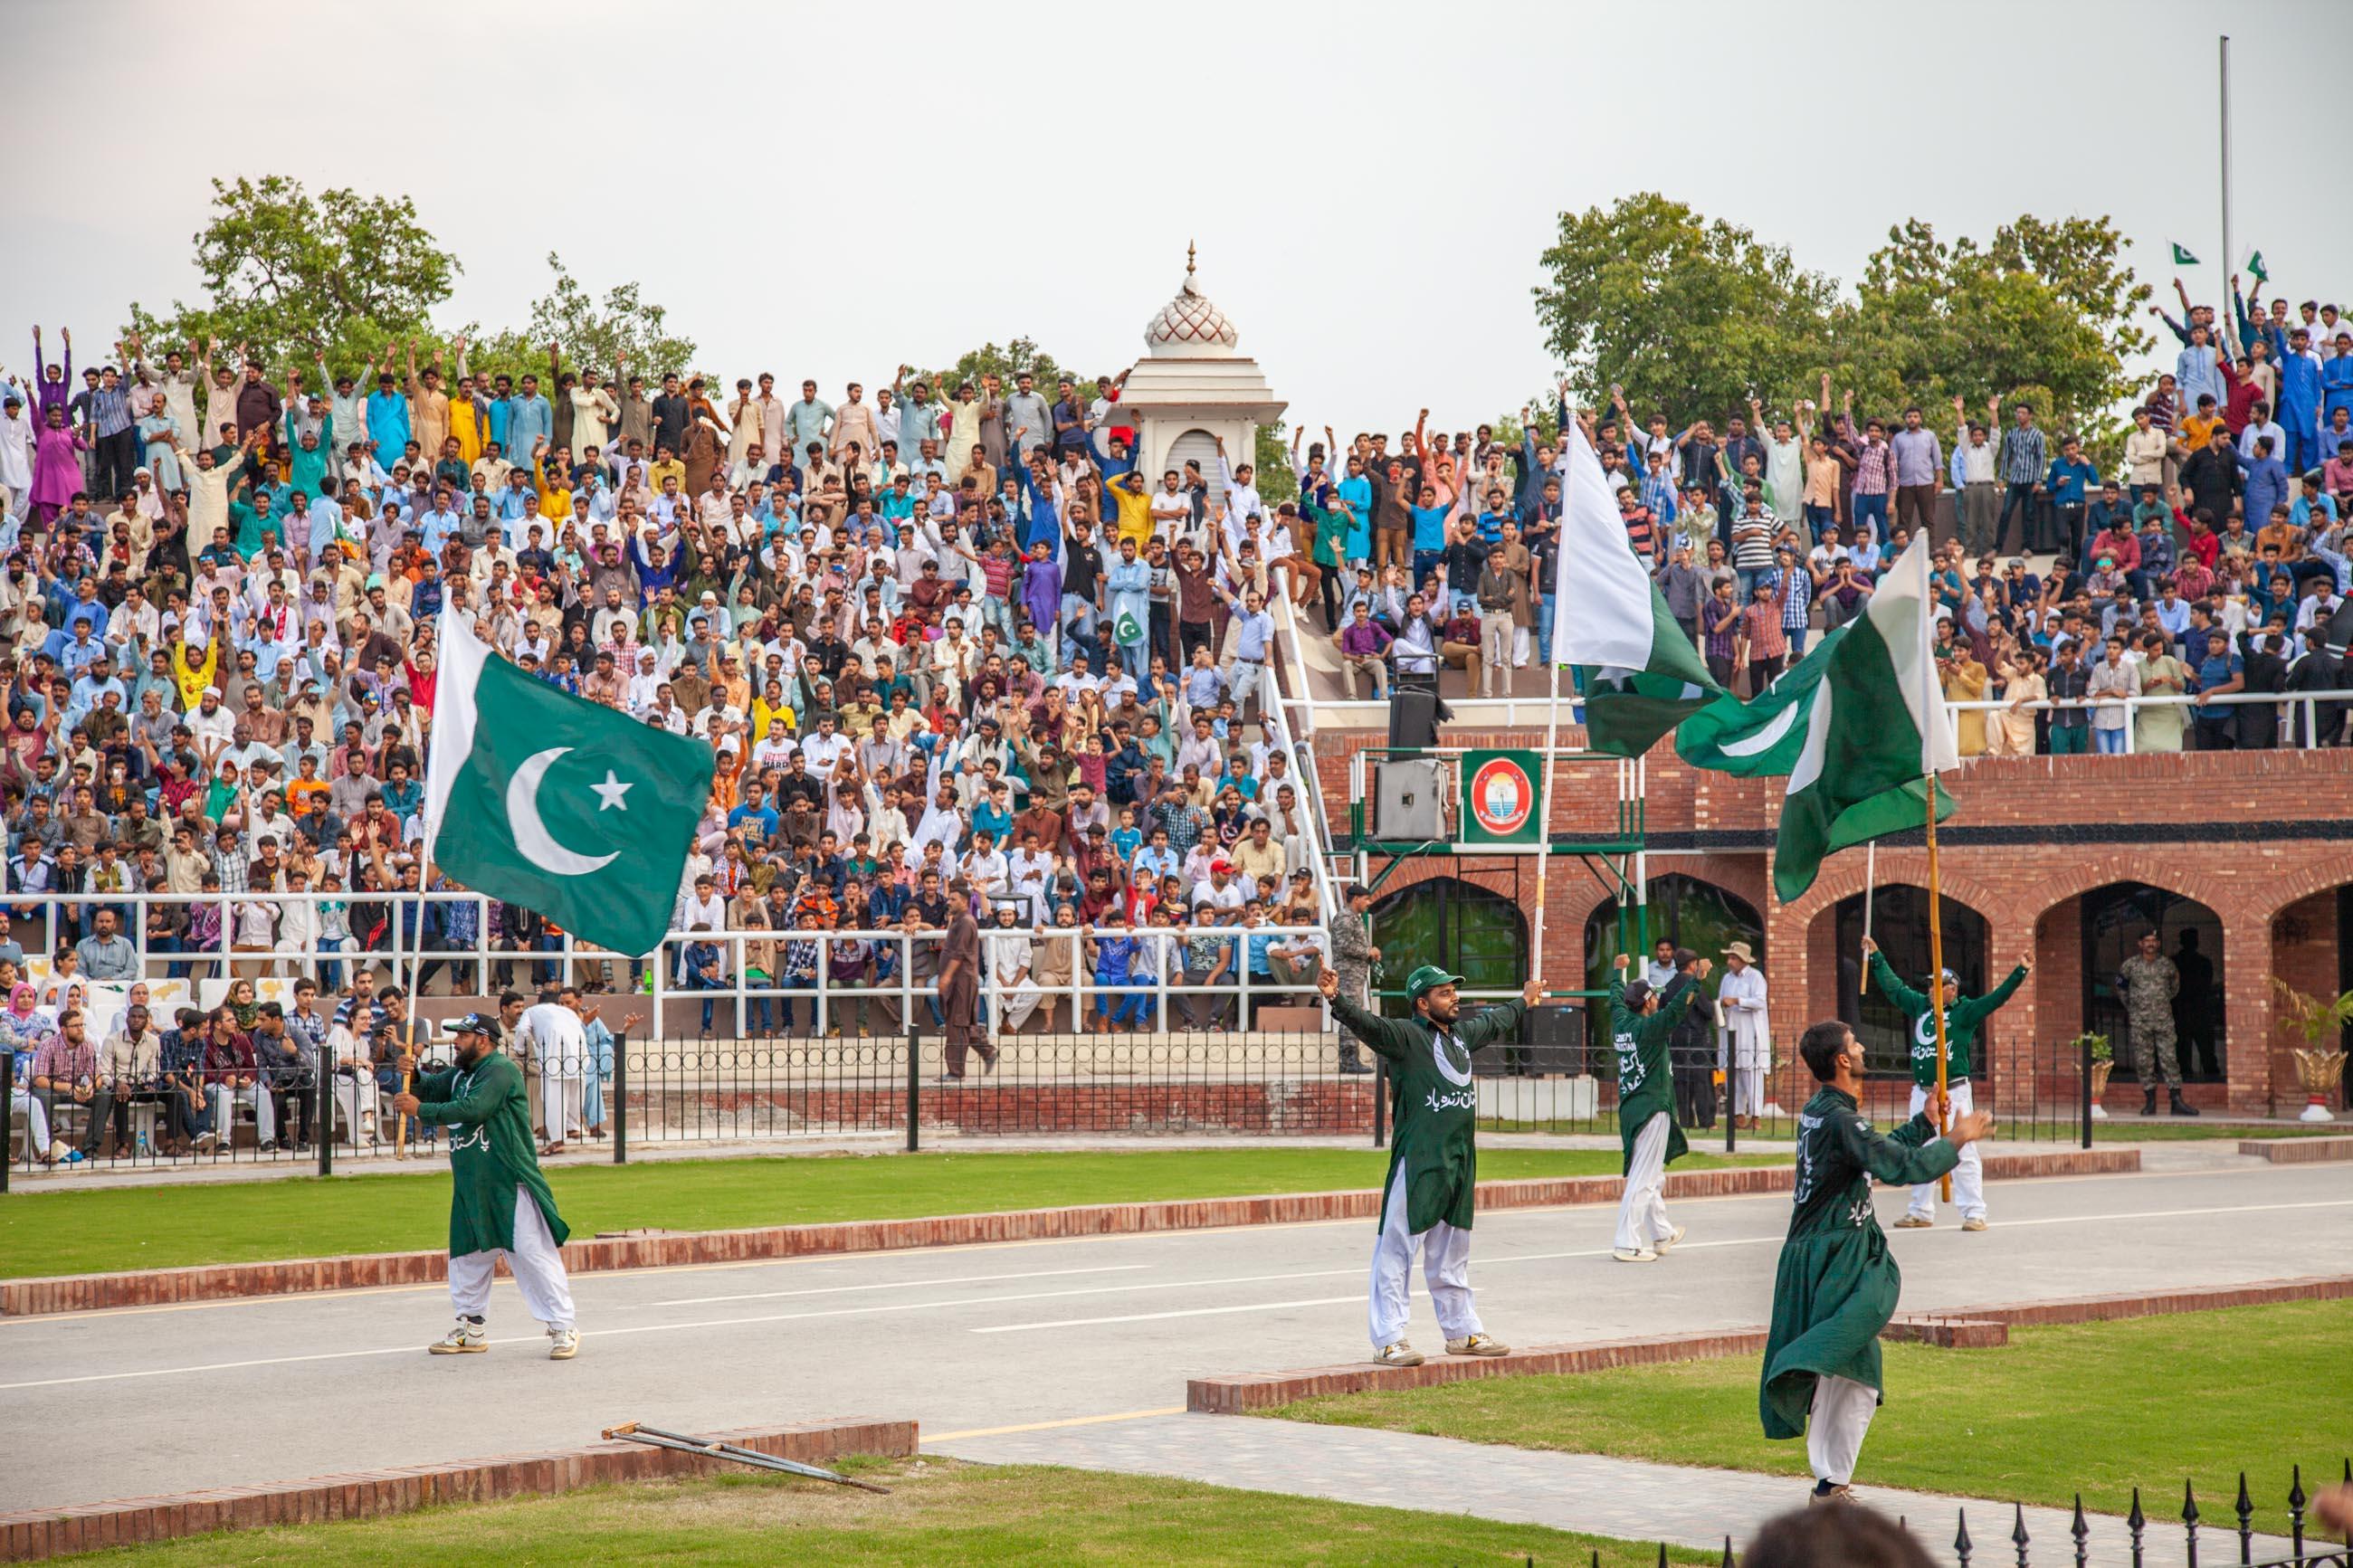 https://bubo.sk/uploads/galleries/4920/samuelklc_pakistan_peshawar_lahore_img_0211.jpg